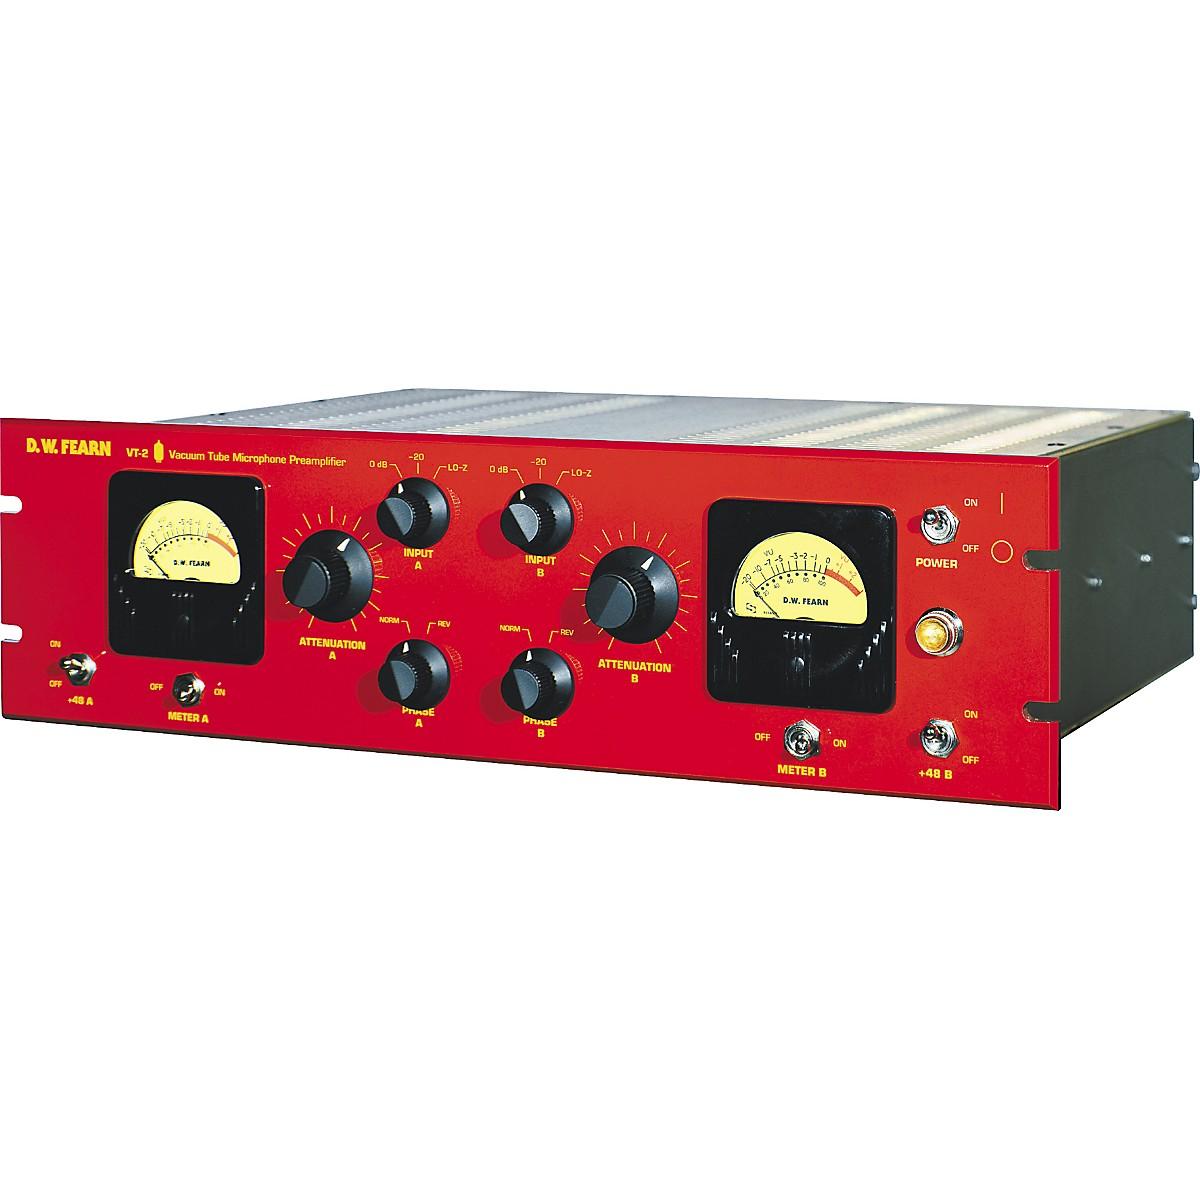 D.W. Fearn VT-2 Dual Channel Vacuum Tube Microphone Preamplifier